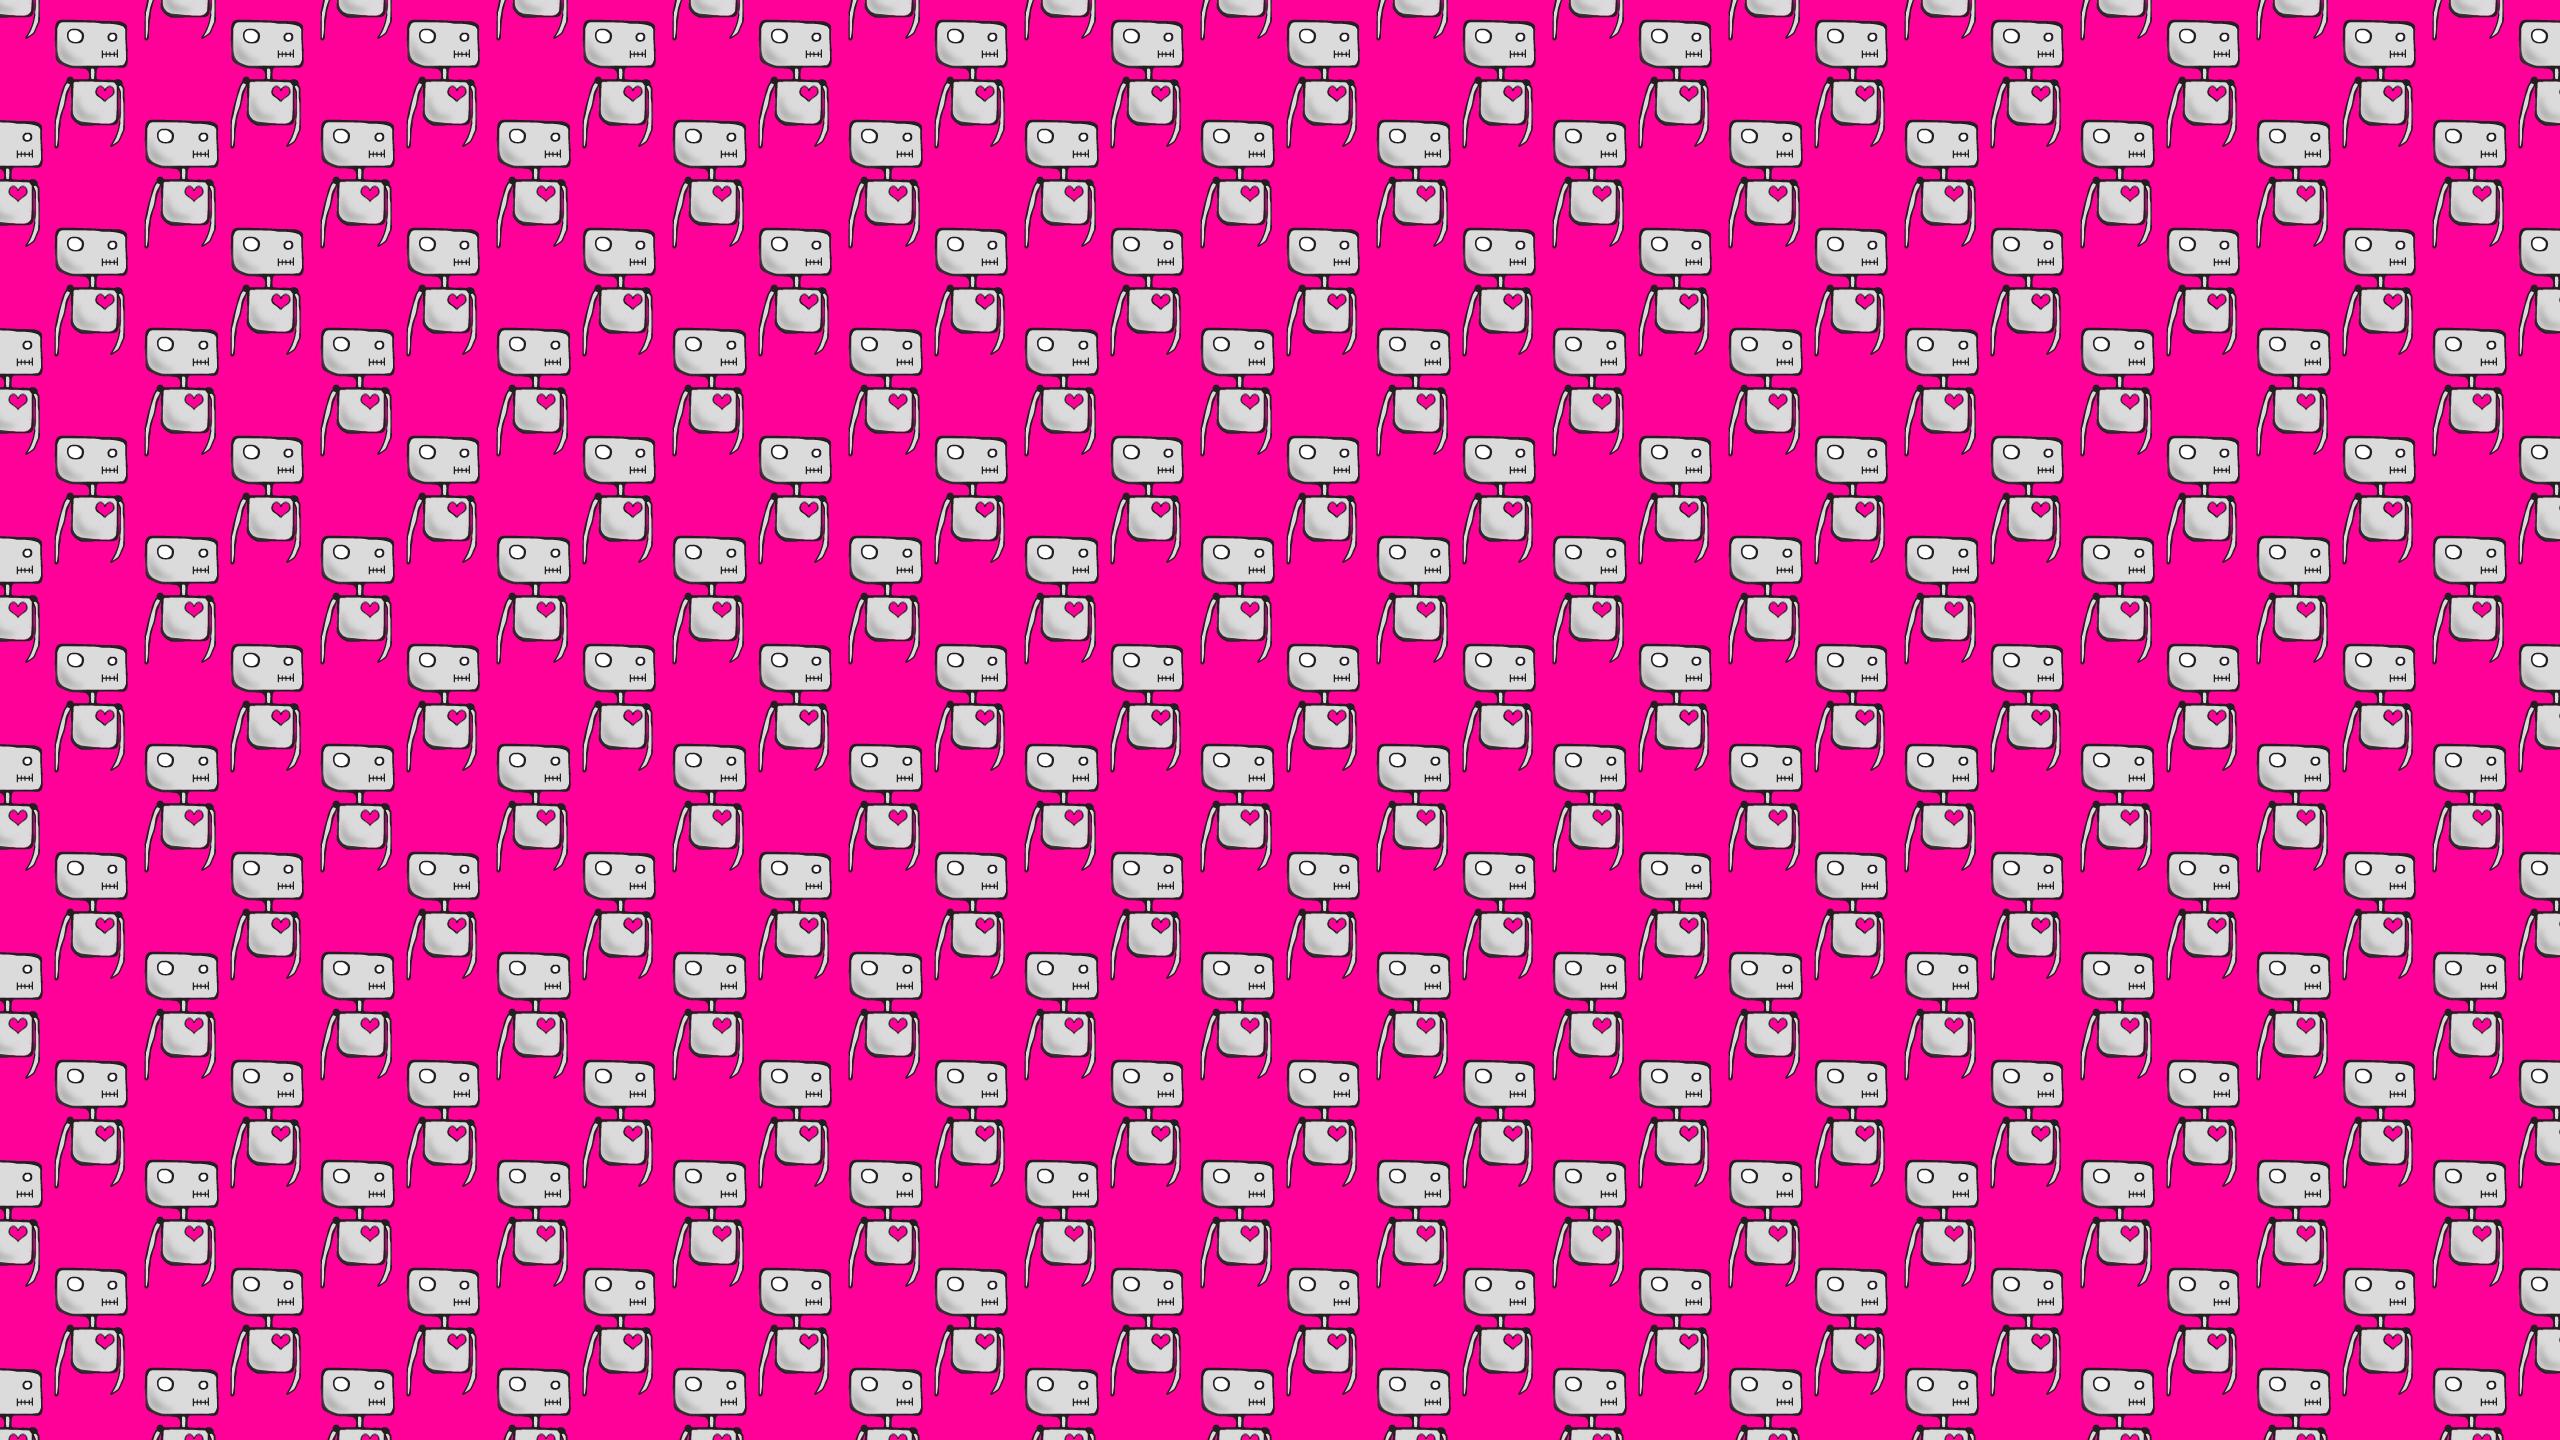 Skate Girl Hd Wallpaper Amor Robots Fondo De Pantalla Patterns Backgrounds